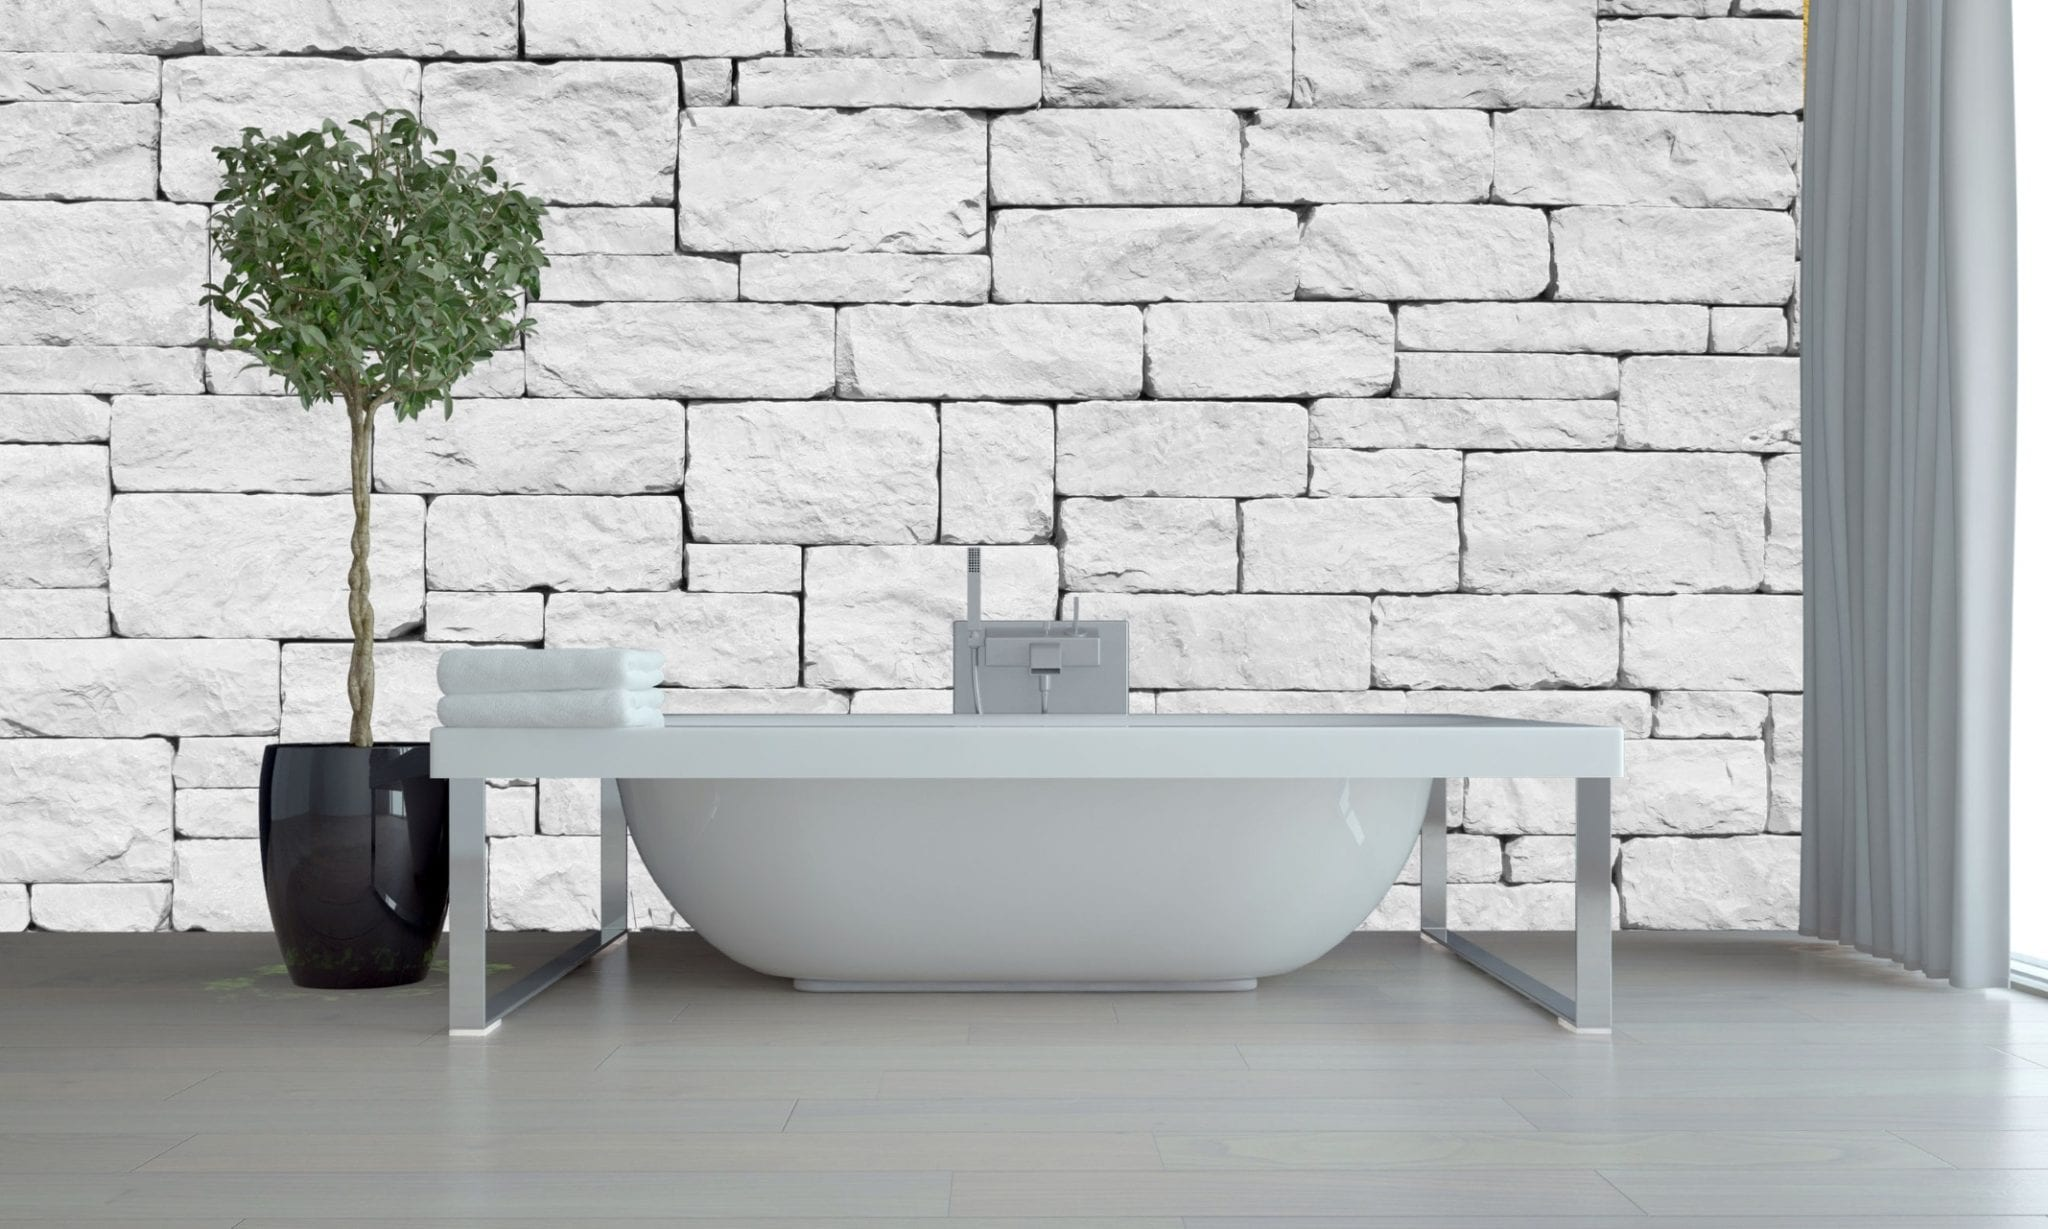 bathroom design and installation service; bathrooms general plumbing